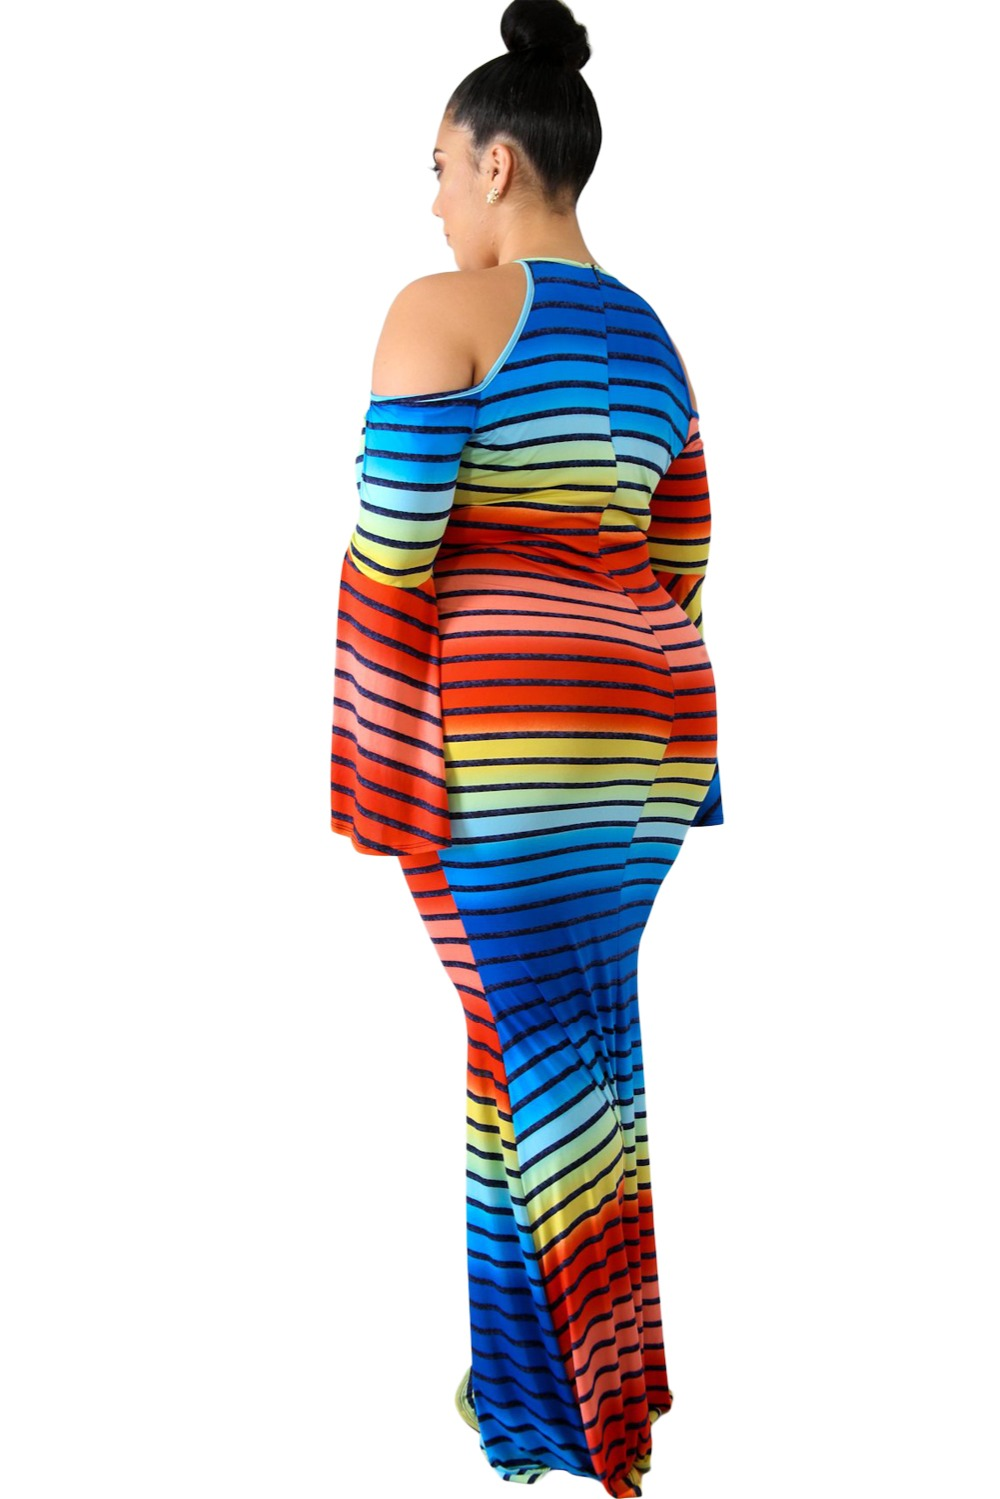 Gosopin Striped Cold Shoulder Plus Size Dress Women Maxi Autumn ... 250d67db5c29